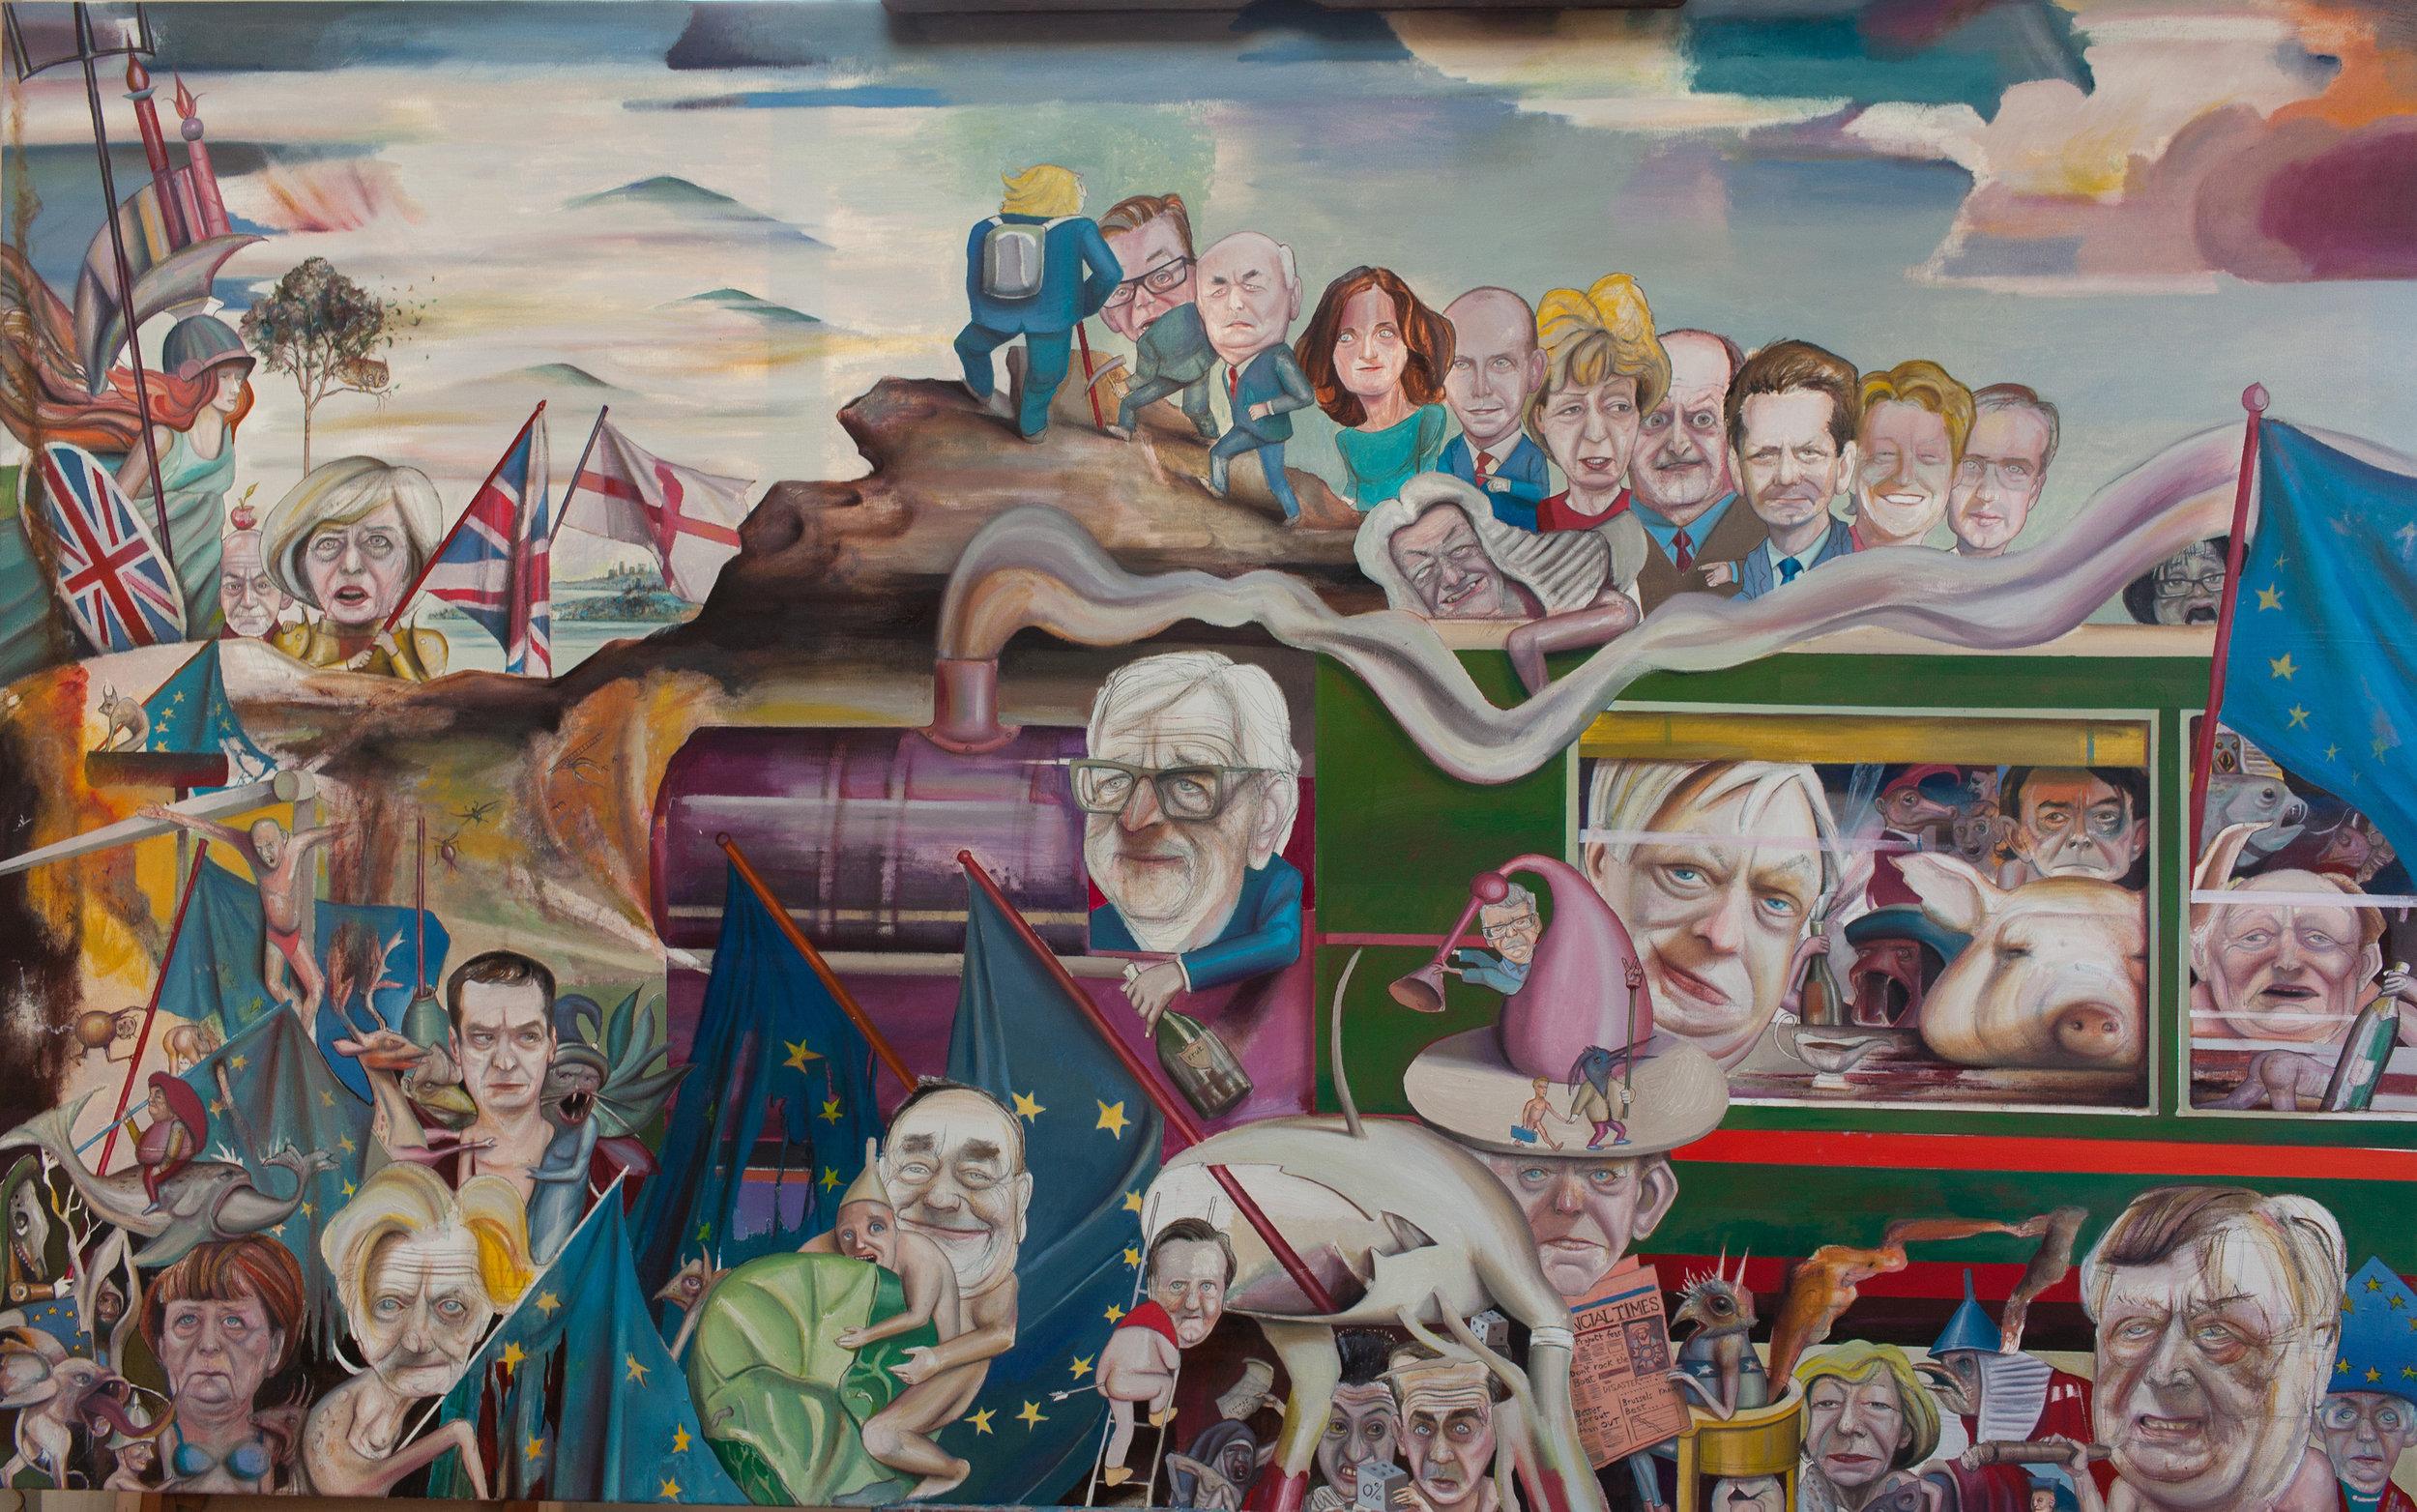 John-Springs-Mustnt-Grumble-Ransom-Art-Gallery.jpg